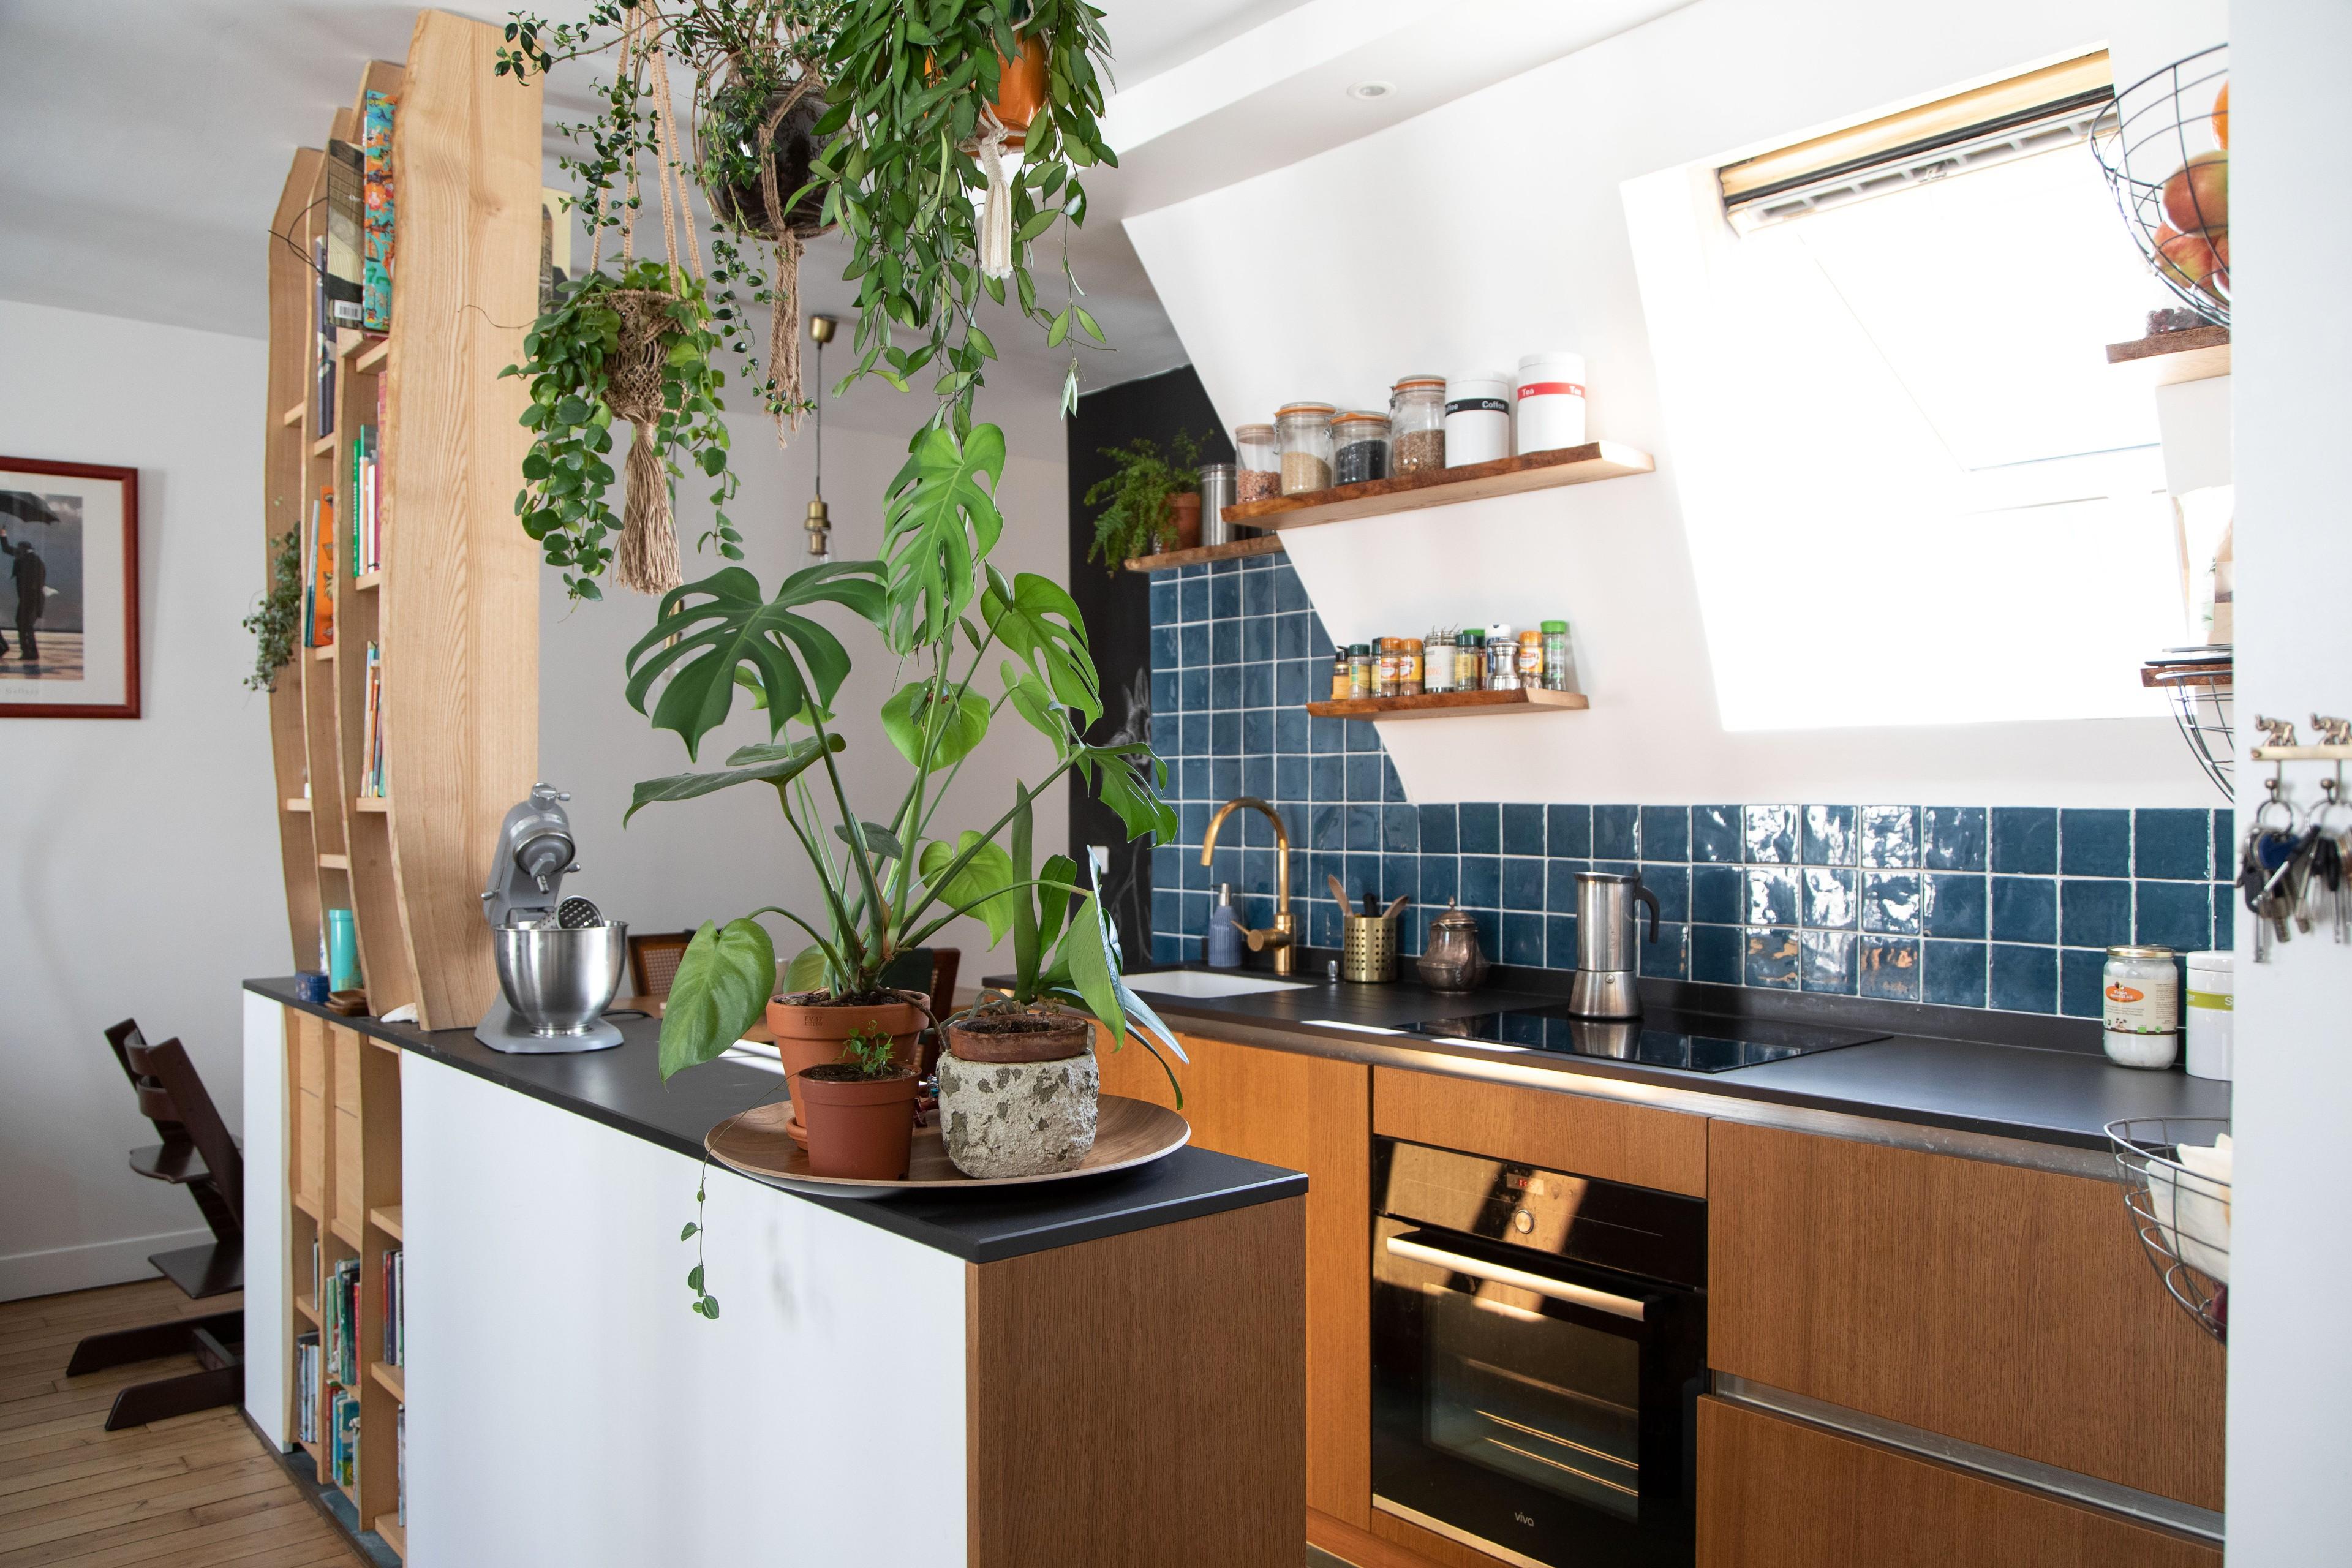 75 Beautiful Small Mediterranean Kitchen Pictures Ideas April 2021 Houzz